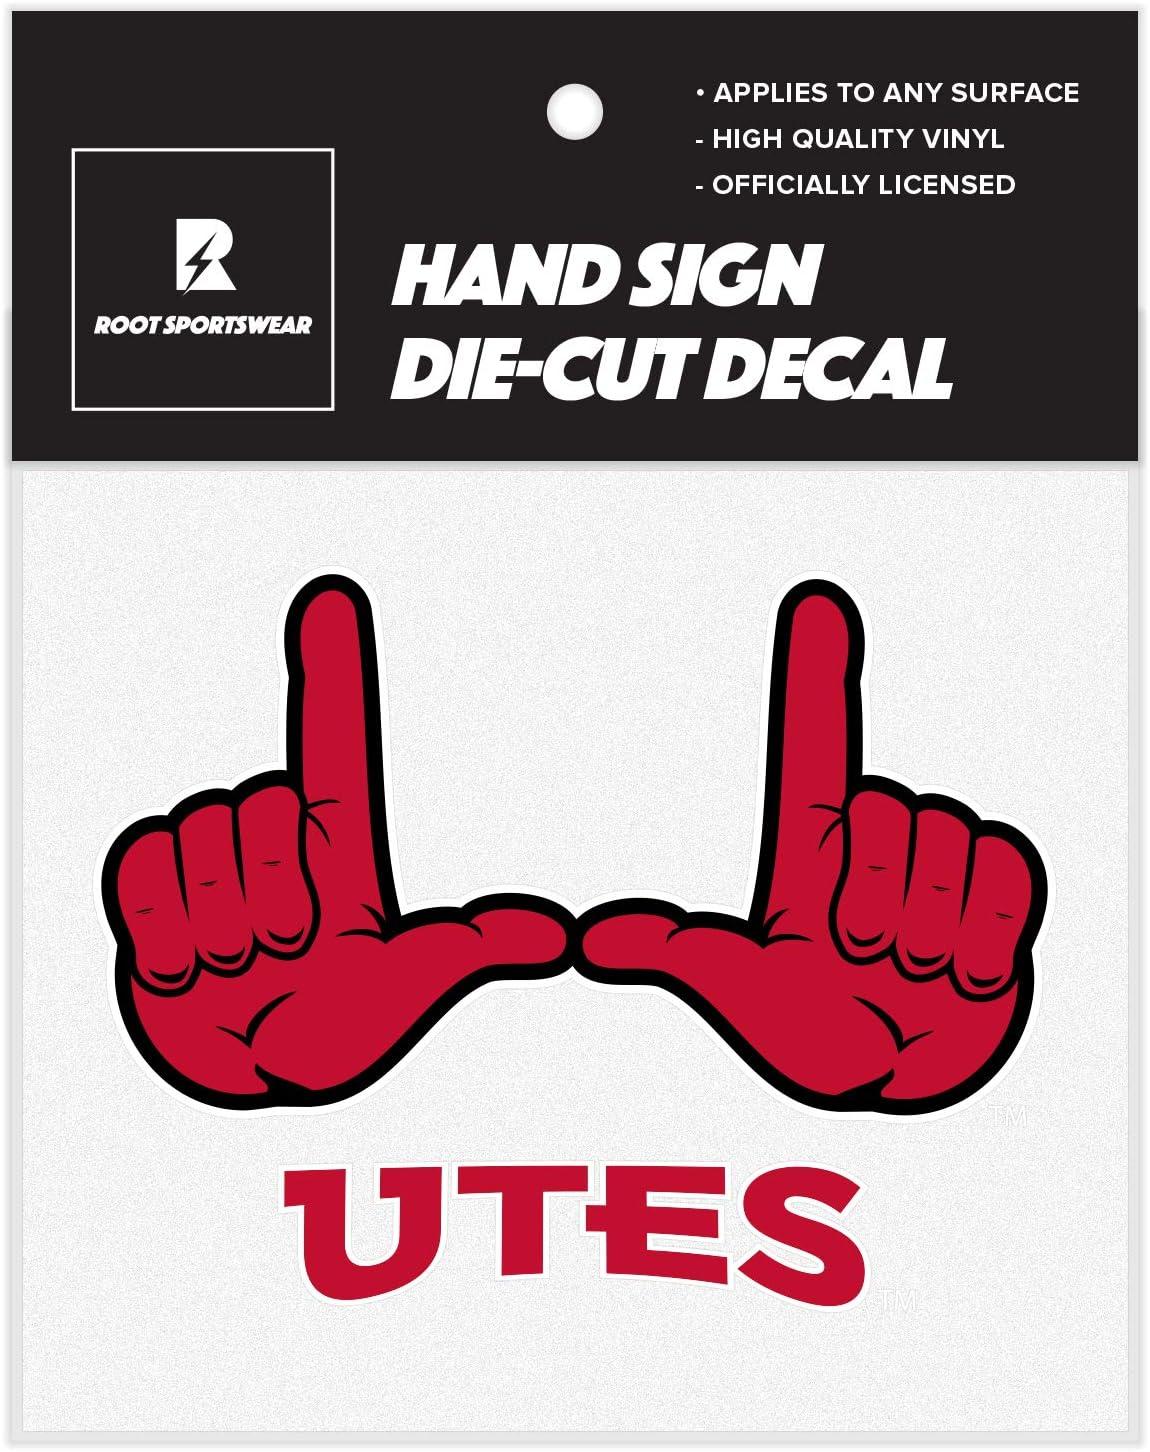 Kansas State Wildcats NCAA College Hand Sign 5x5 Vinyl Die-Cut Car Decal Sticker